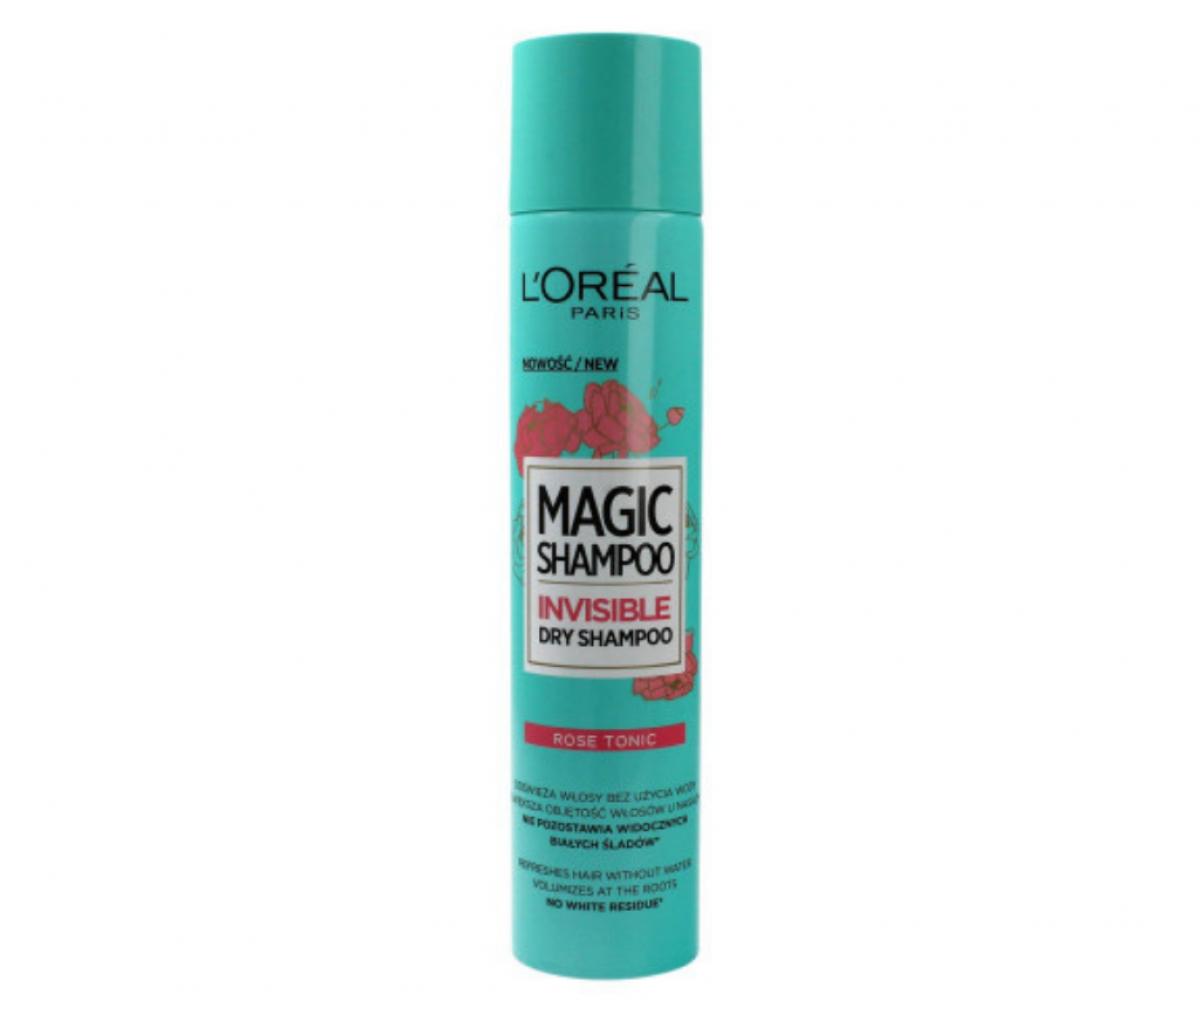 Loreal 200ml Magic Dry Shampoo Rose Tonic